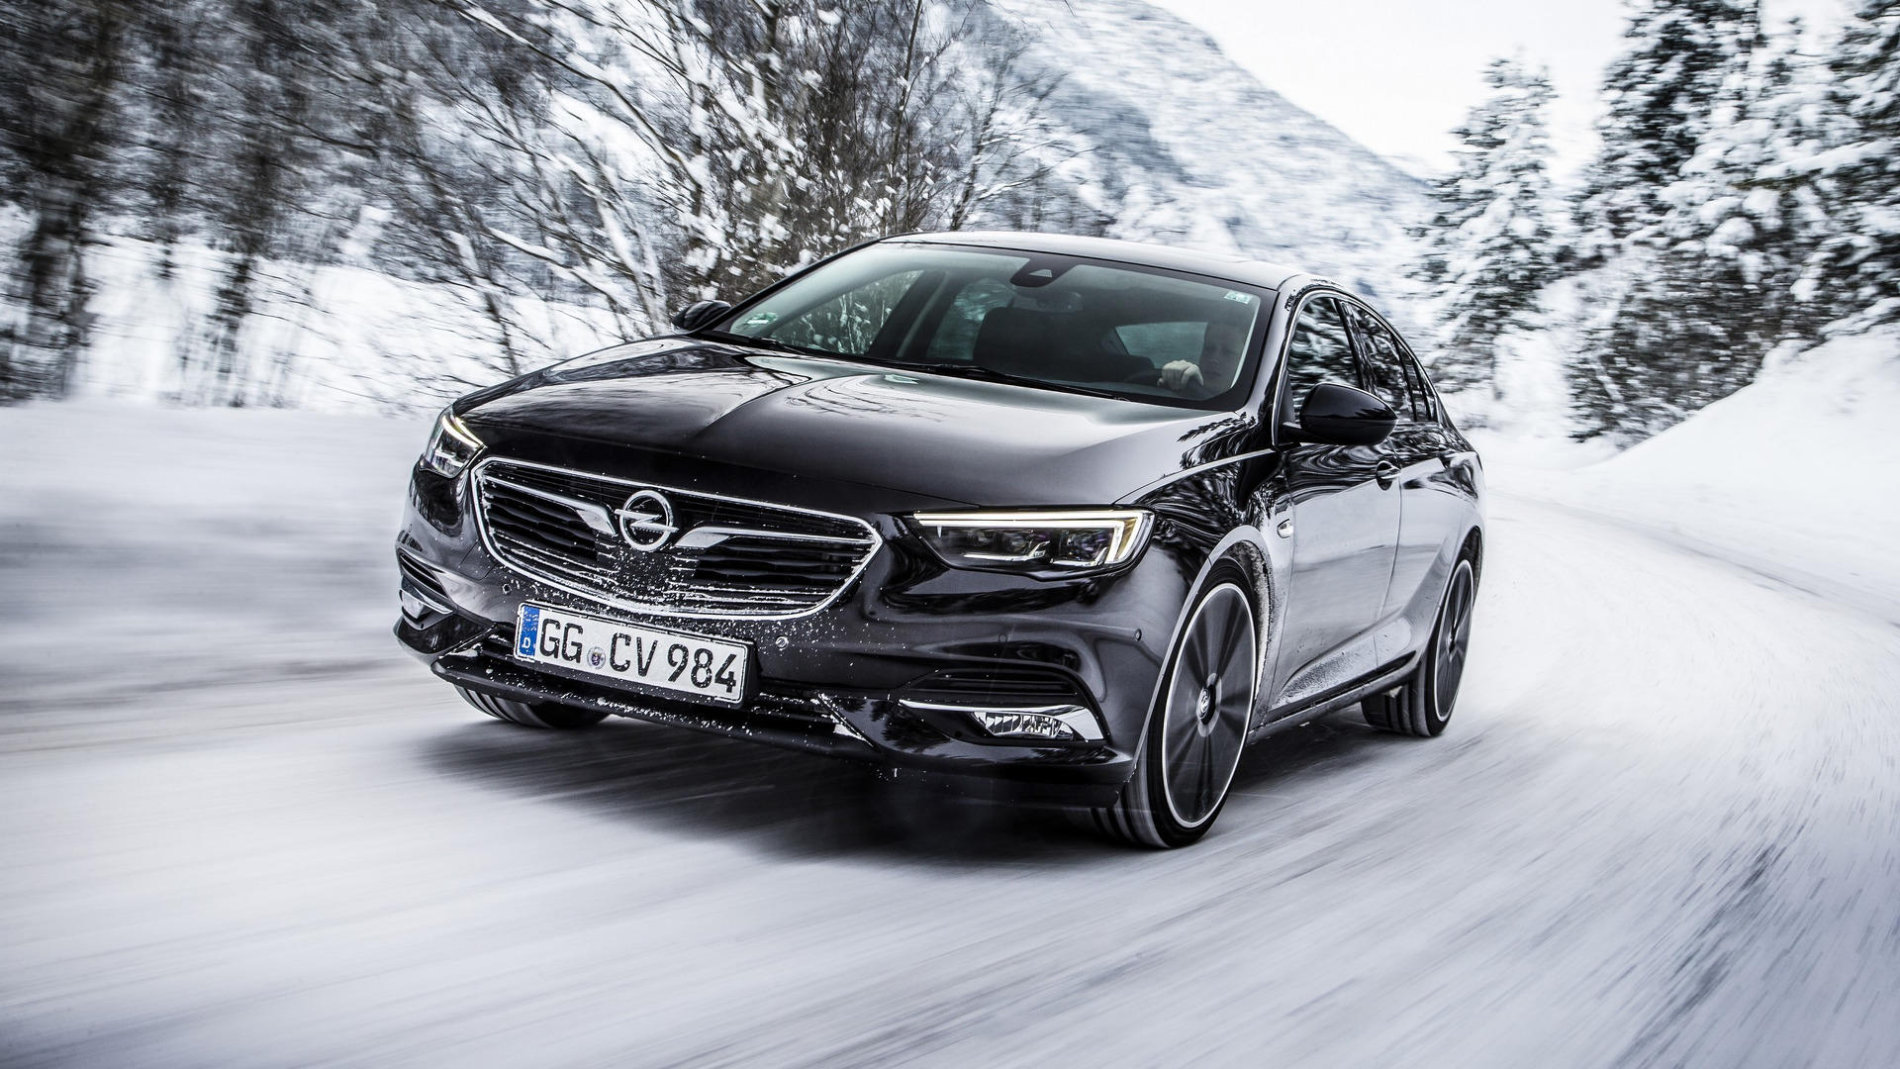 Opel Insignia Grand Sport 4x4 - Opel Insignia Grand Sport 4x4